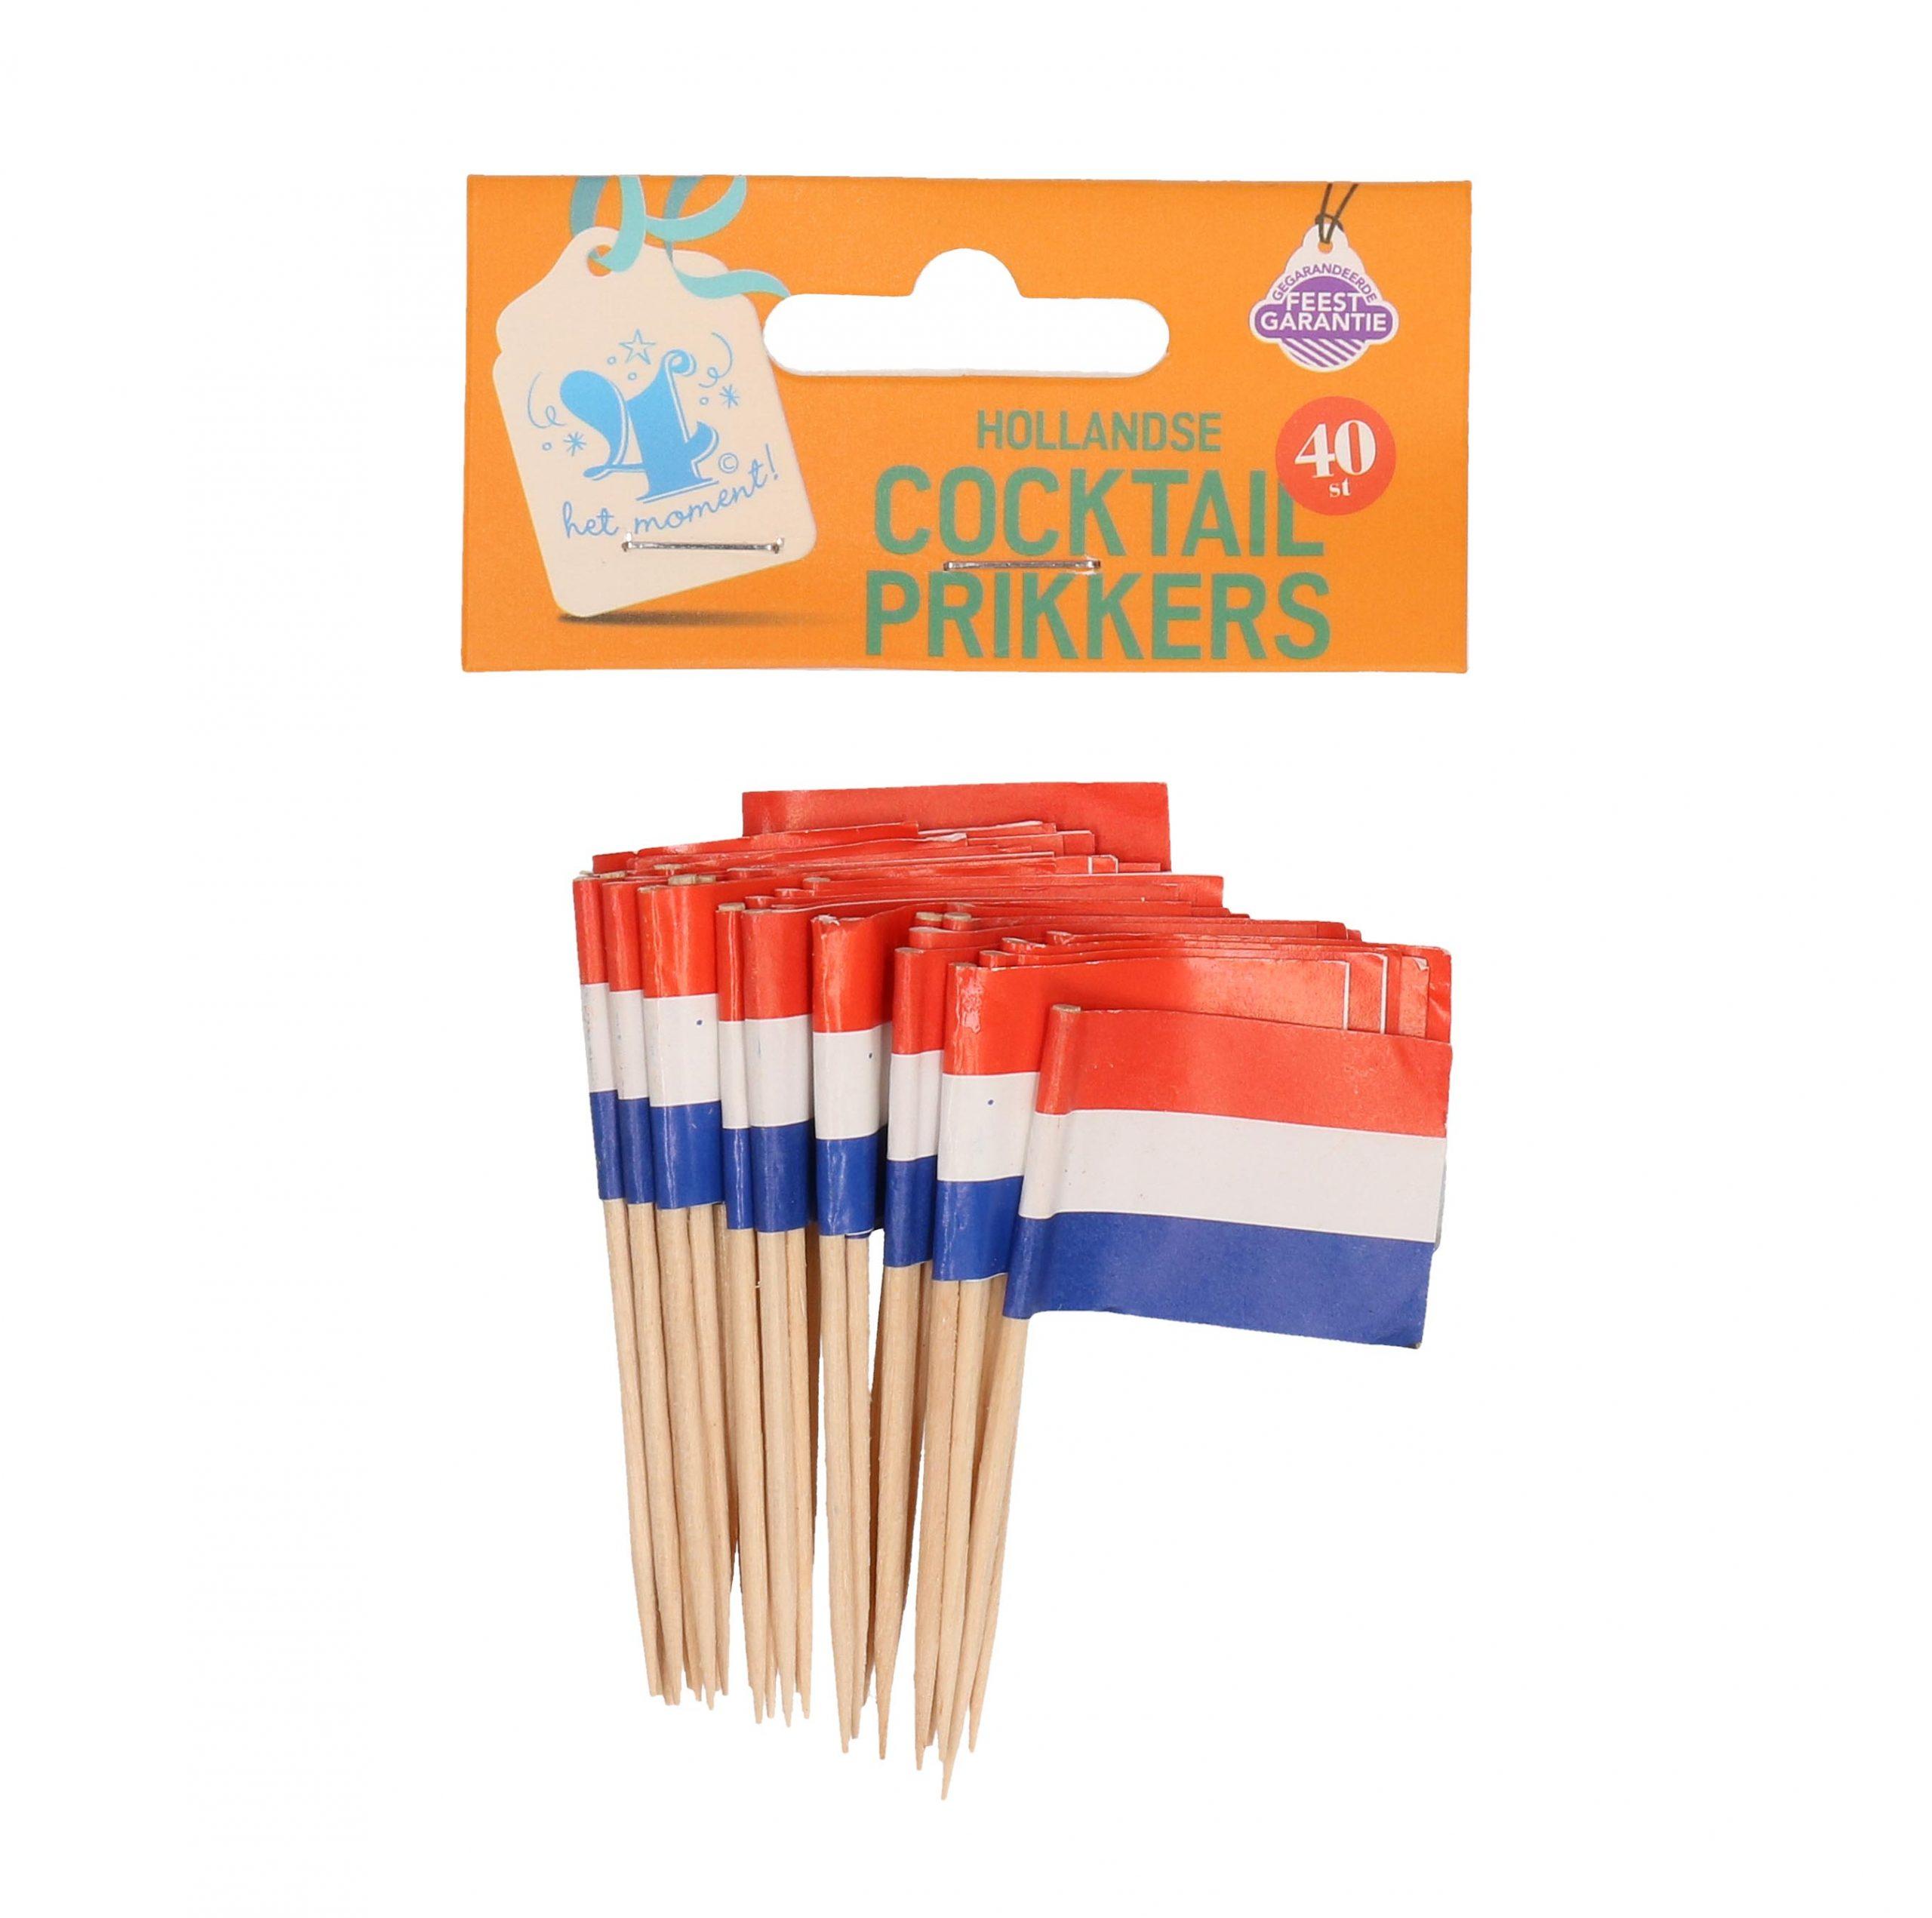 Cocktailprikkers Holland 40 stuks